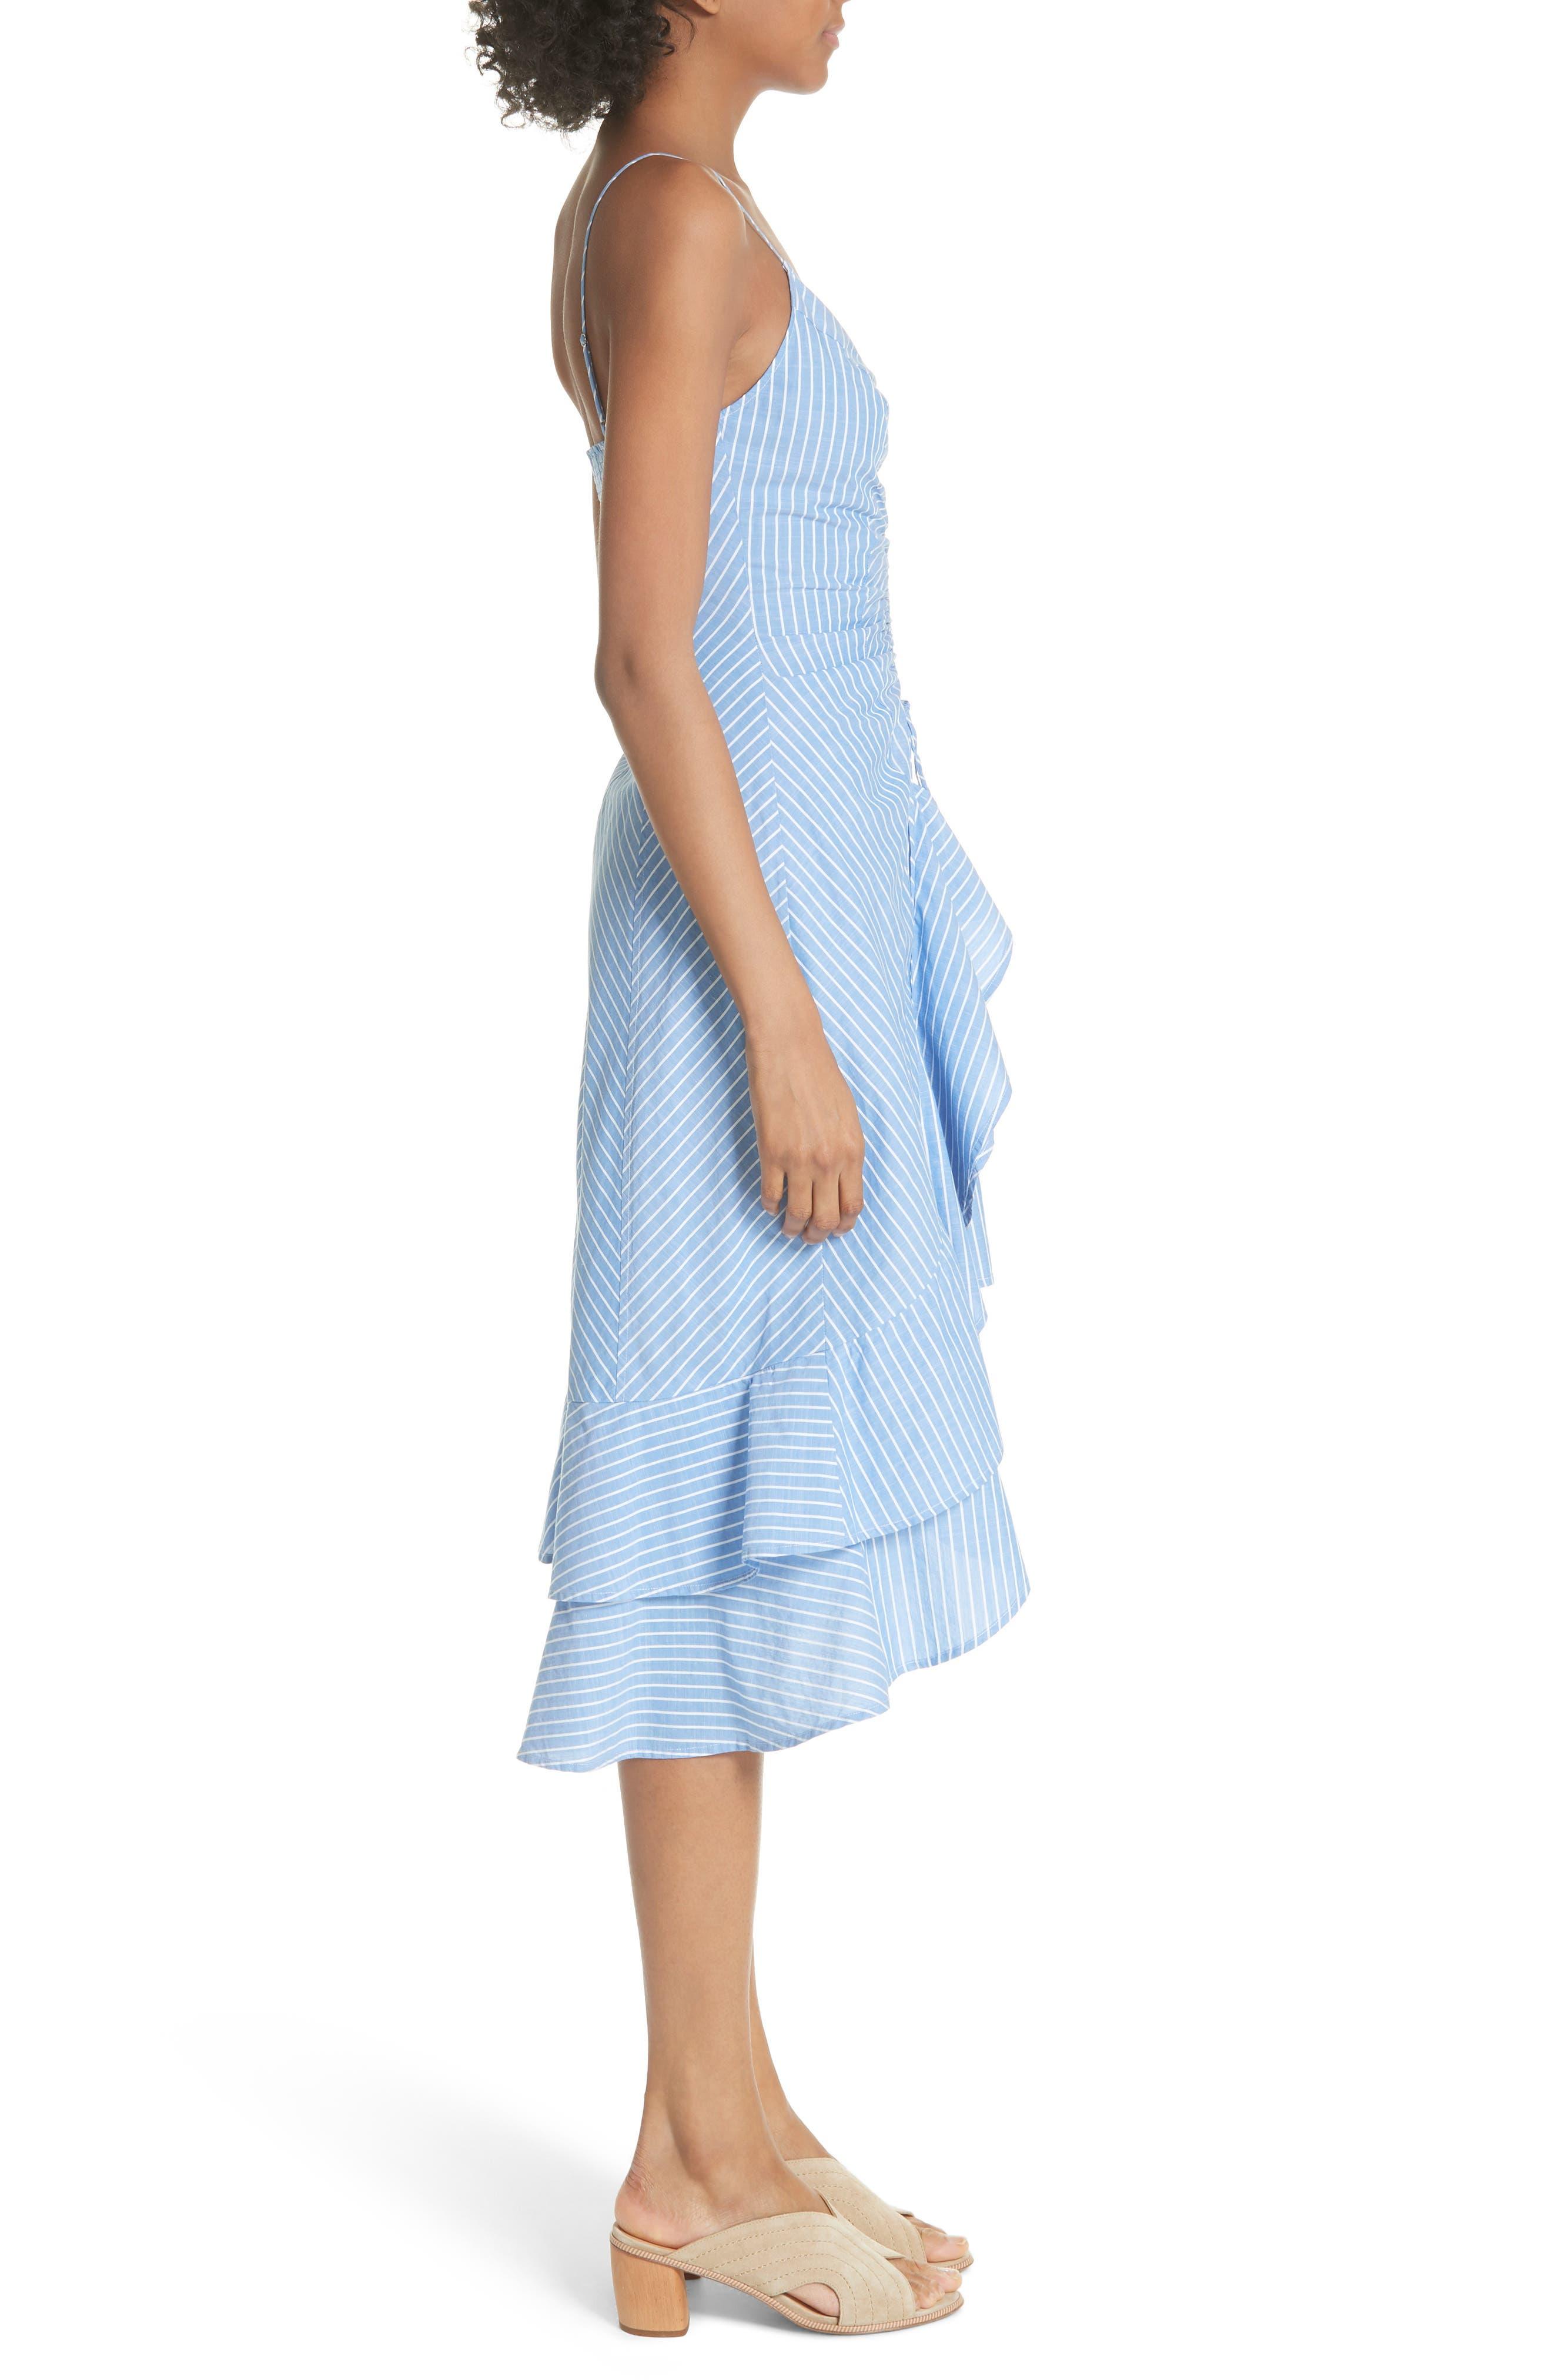 Eberta Stripe High/Low Dress,                             Alternate thumbnail 3, color,                             FRENCH CHAMBRAY